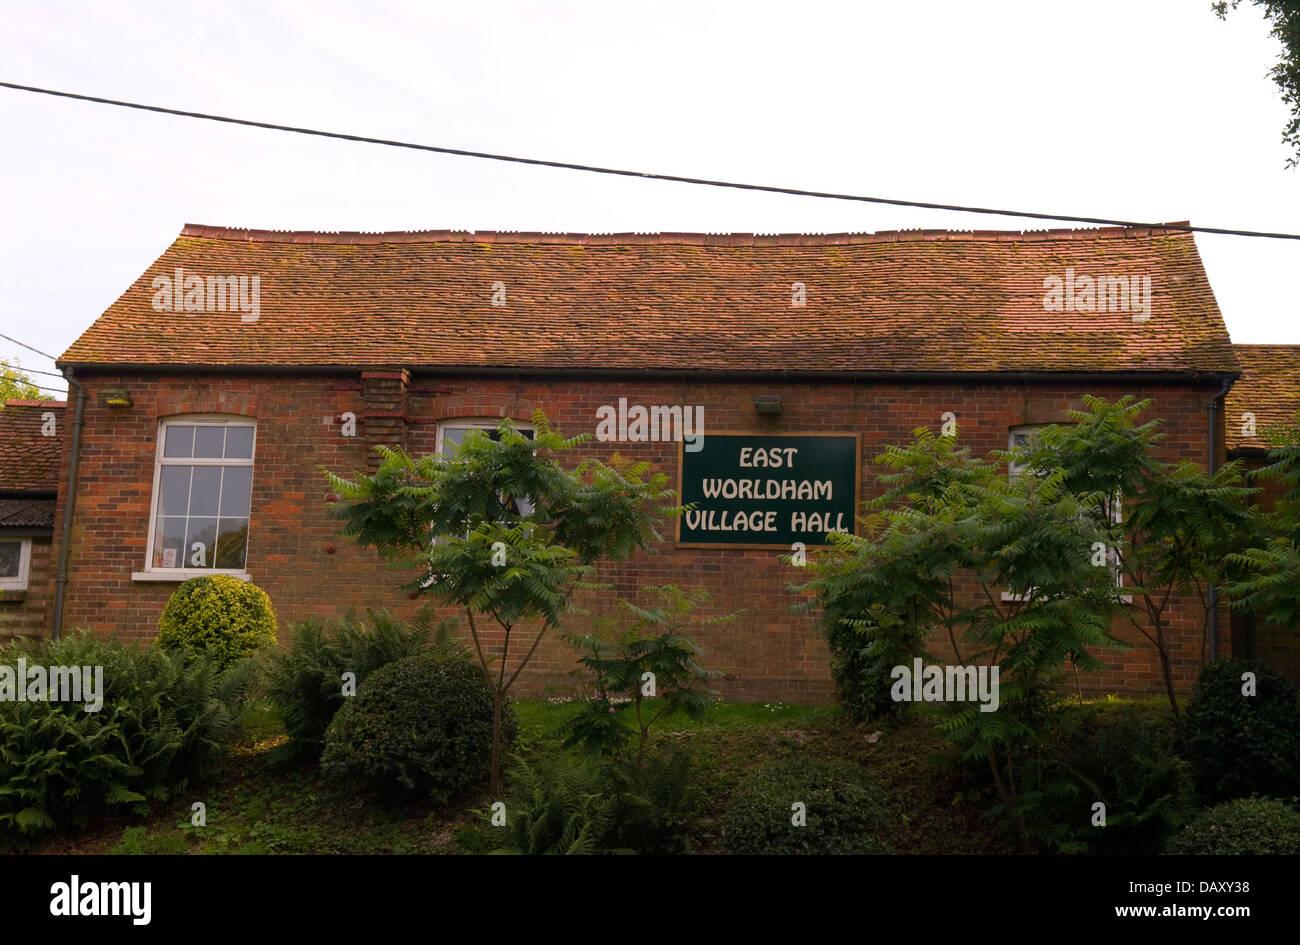 General view of East Worldham Village Hall, East Worldham, Hampshire, UK. - Stock Image